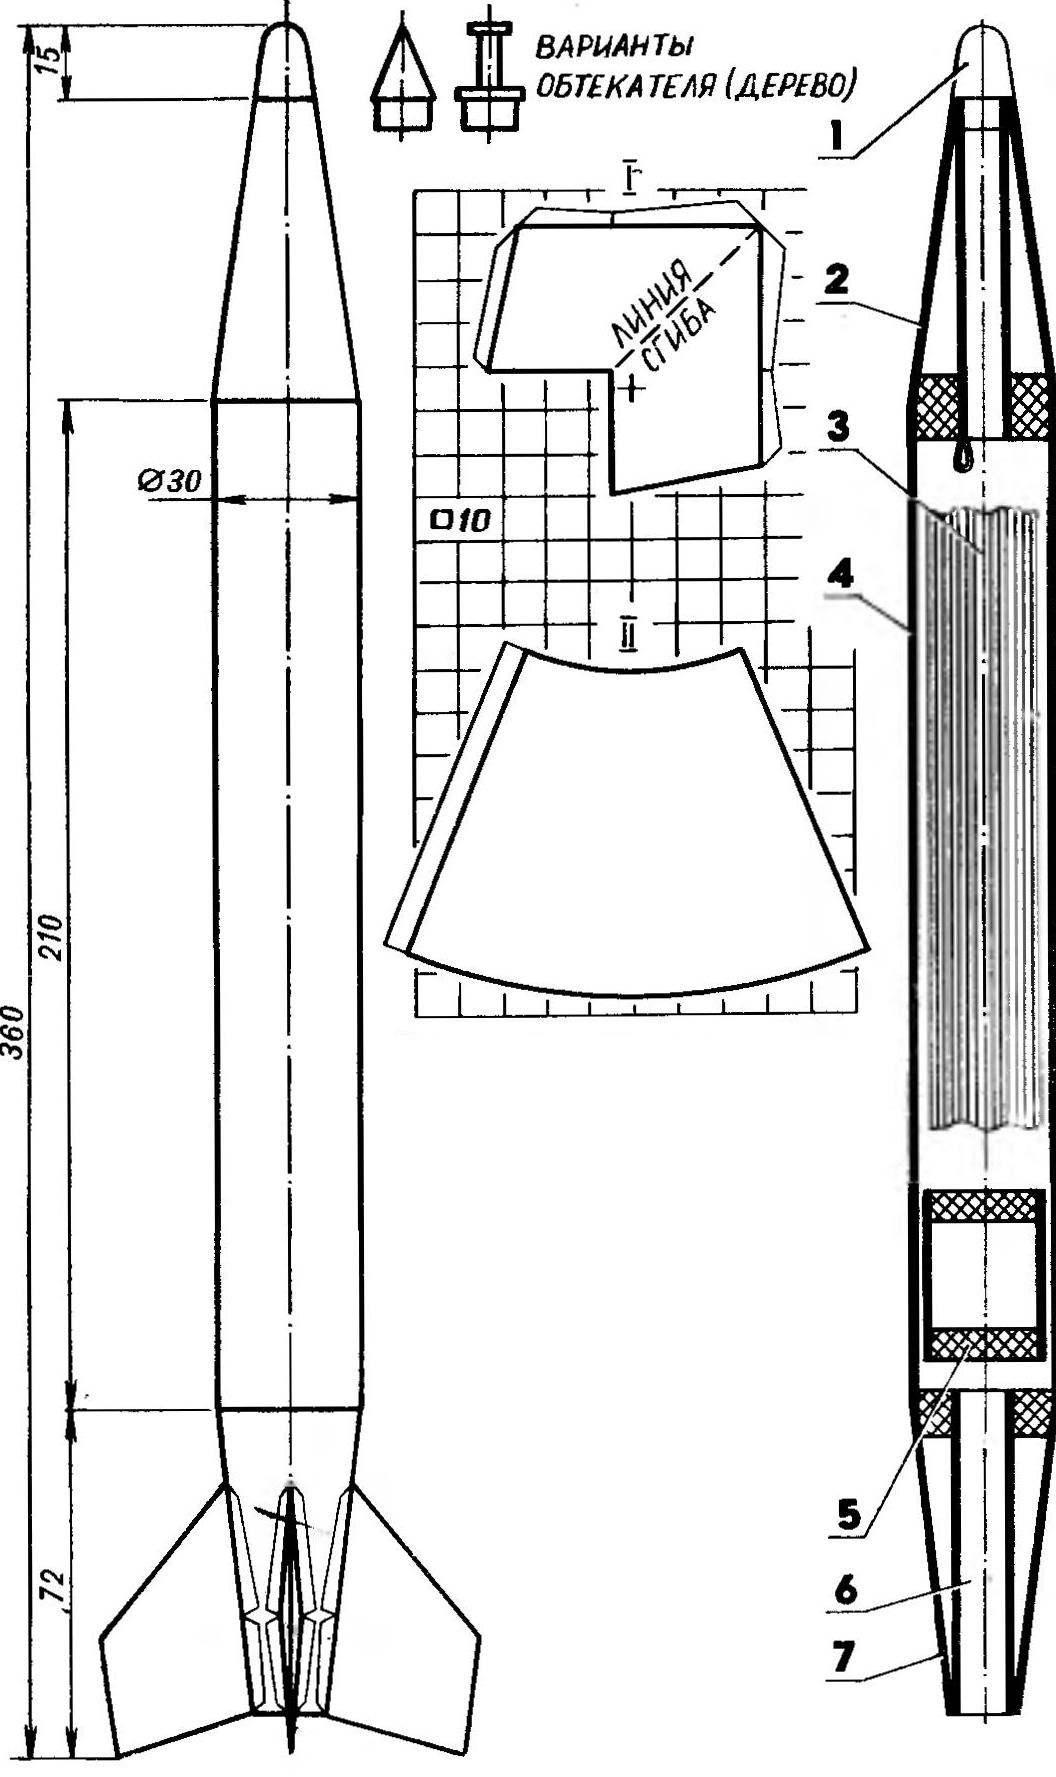 Fig. 3. A model rocket